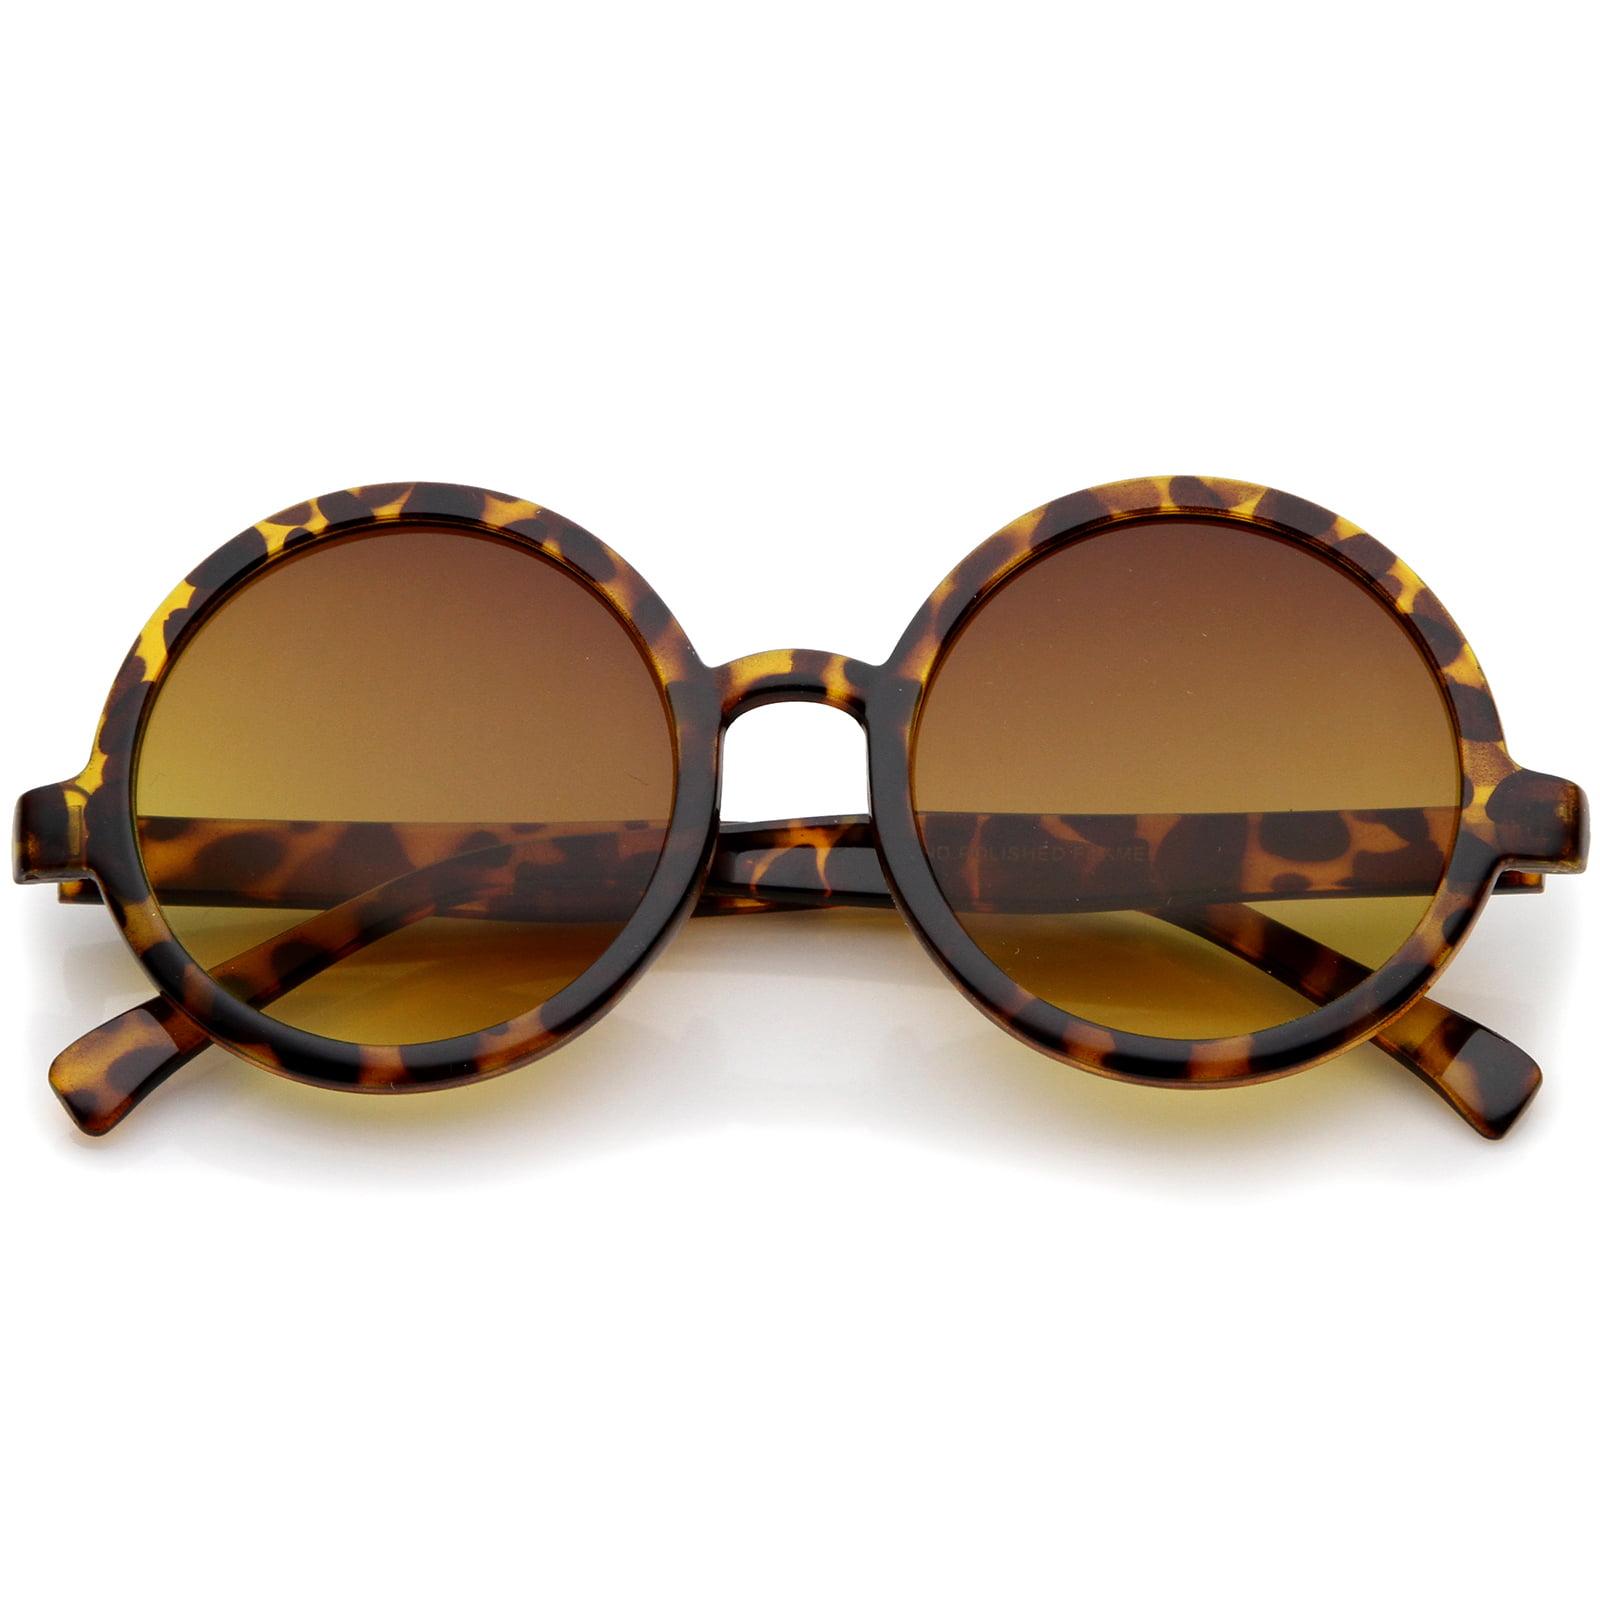 sunglassLA - Classic Retro Horn Rimmed Neutral-Colored Lens Round Sunglasses 52mm - 52mm